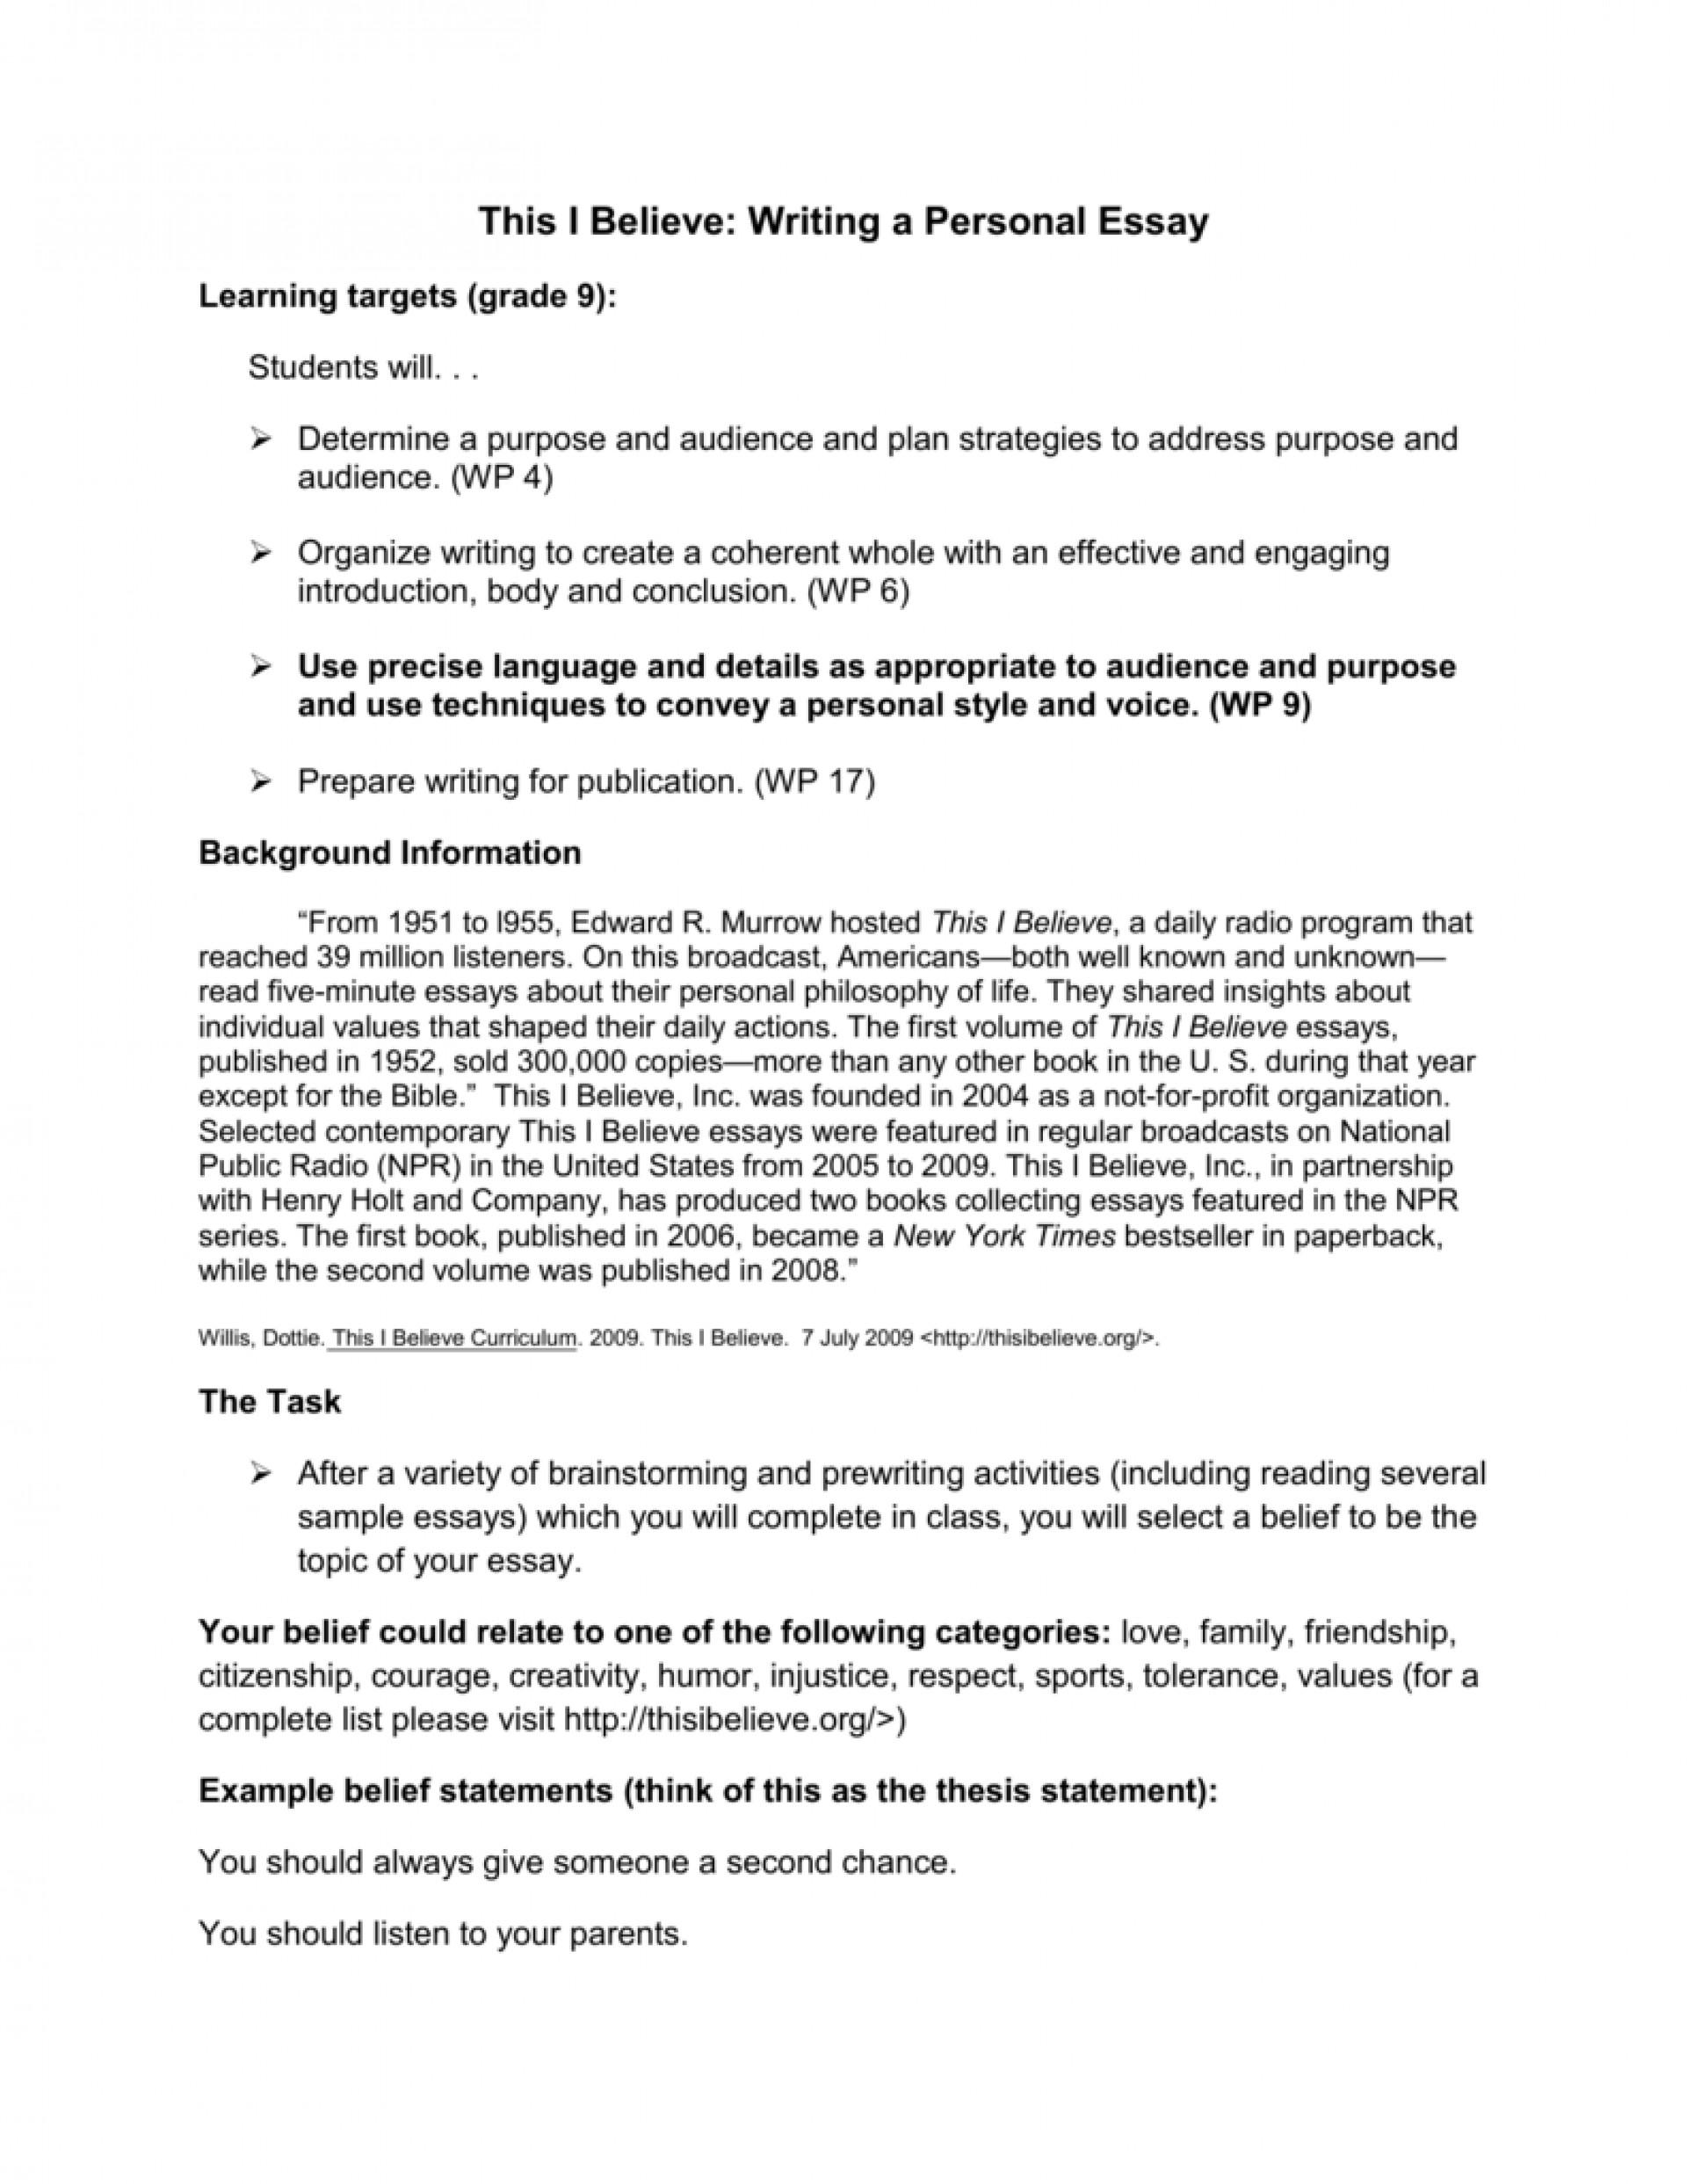 002 This I Believe Essay Examples Example 006750112 1 Stupendous Npr College 1920